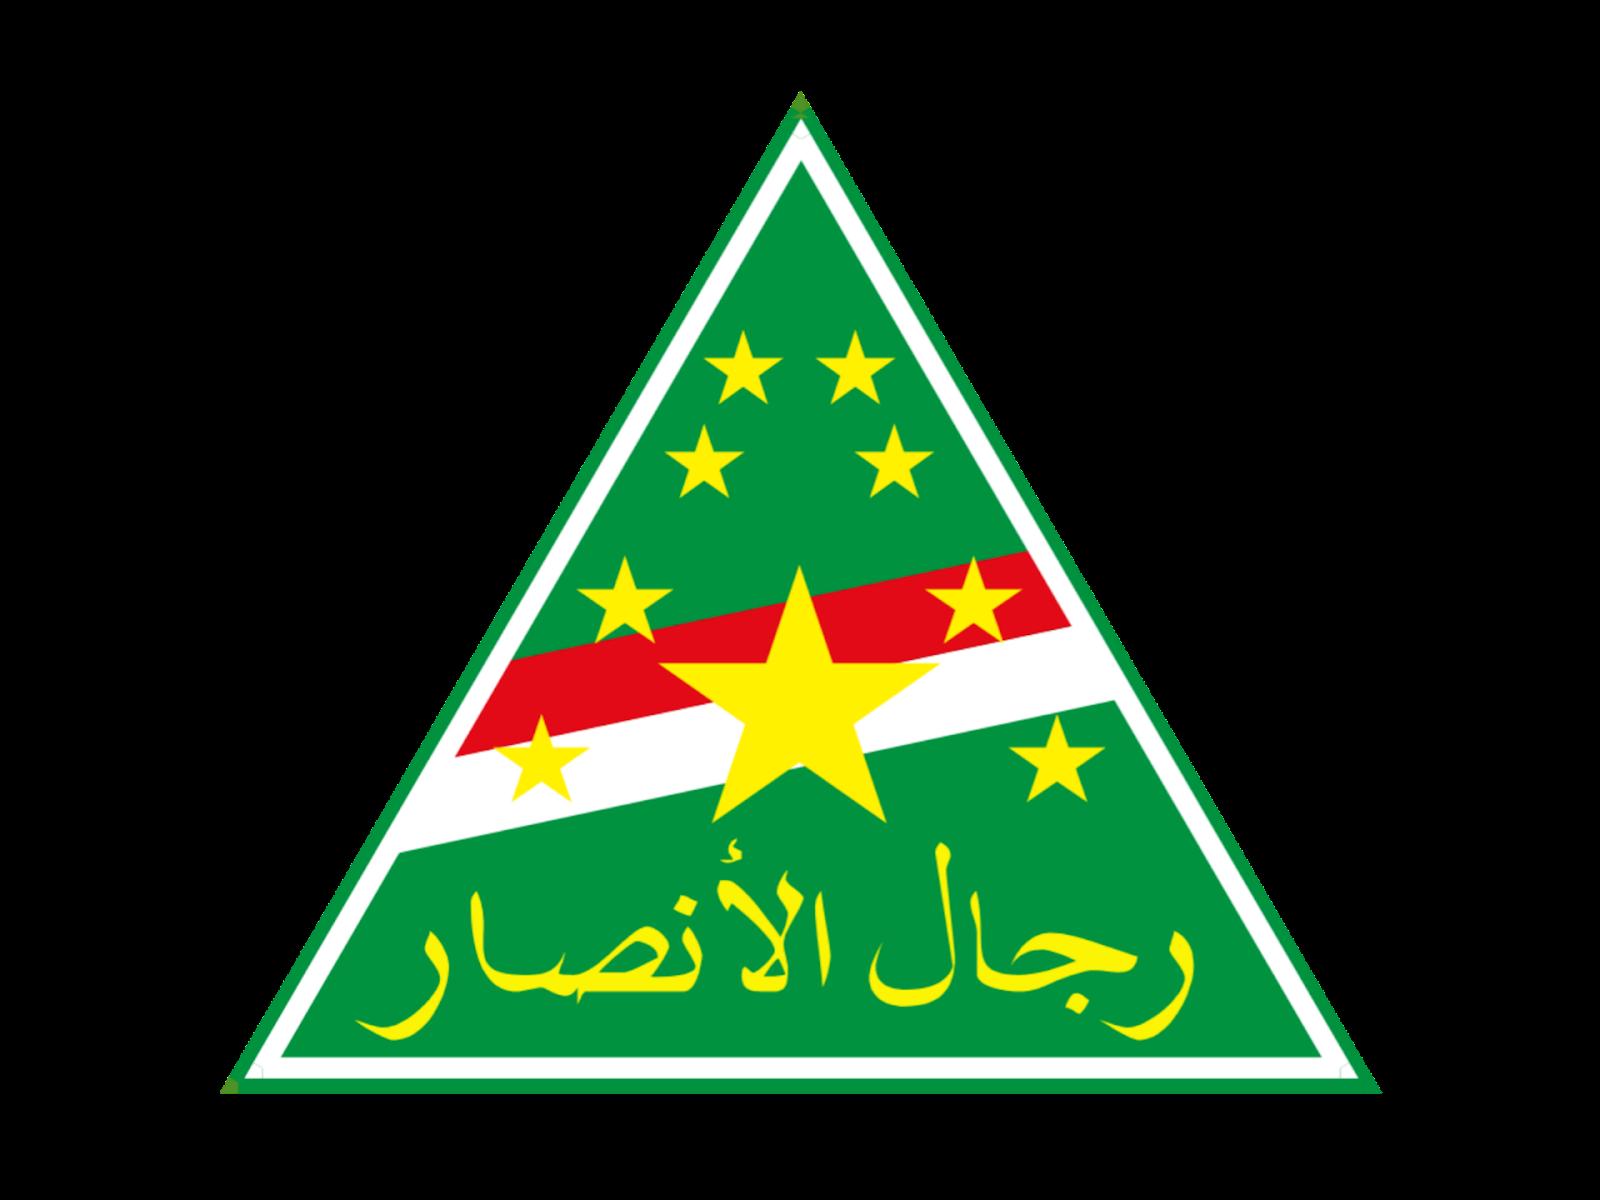 Logo Rijalul Ansor Format PNG